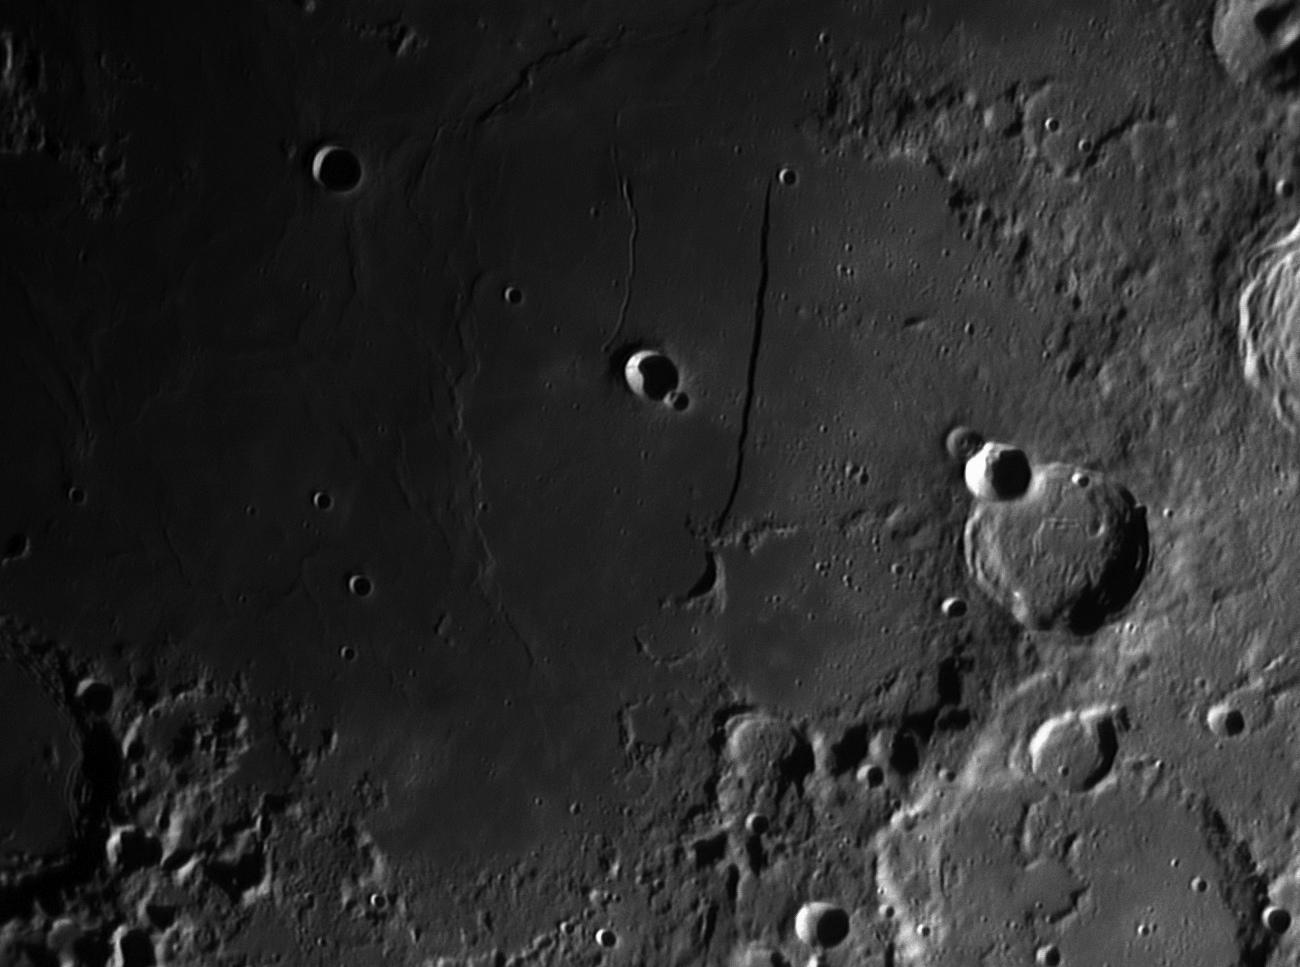 Moon_203710_lapl4_ap311 mur droit 2.jpg